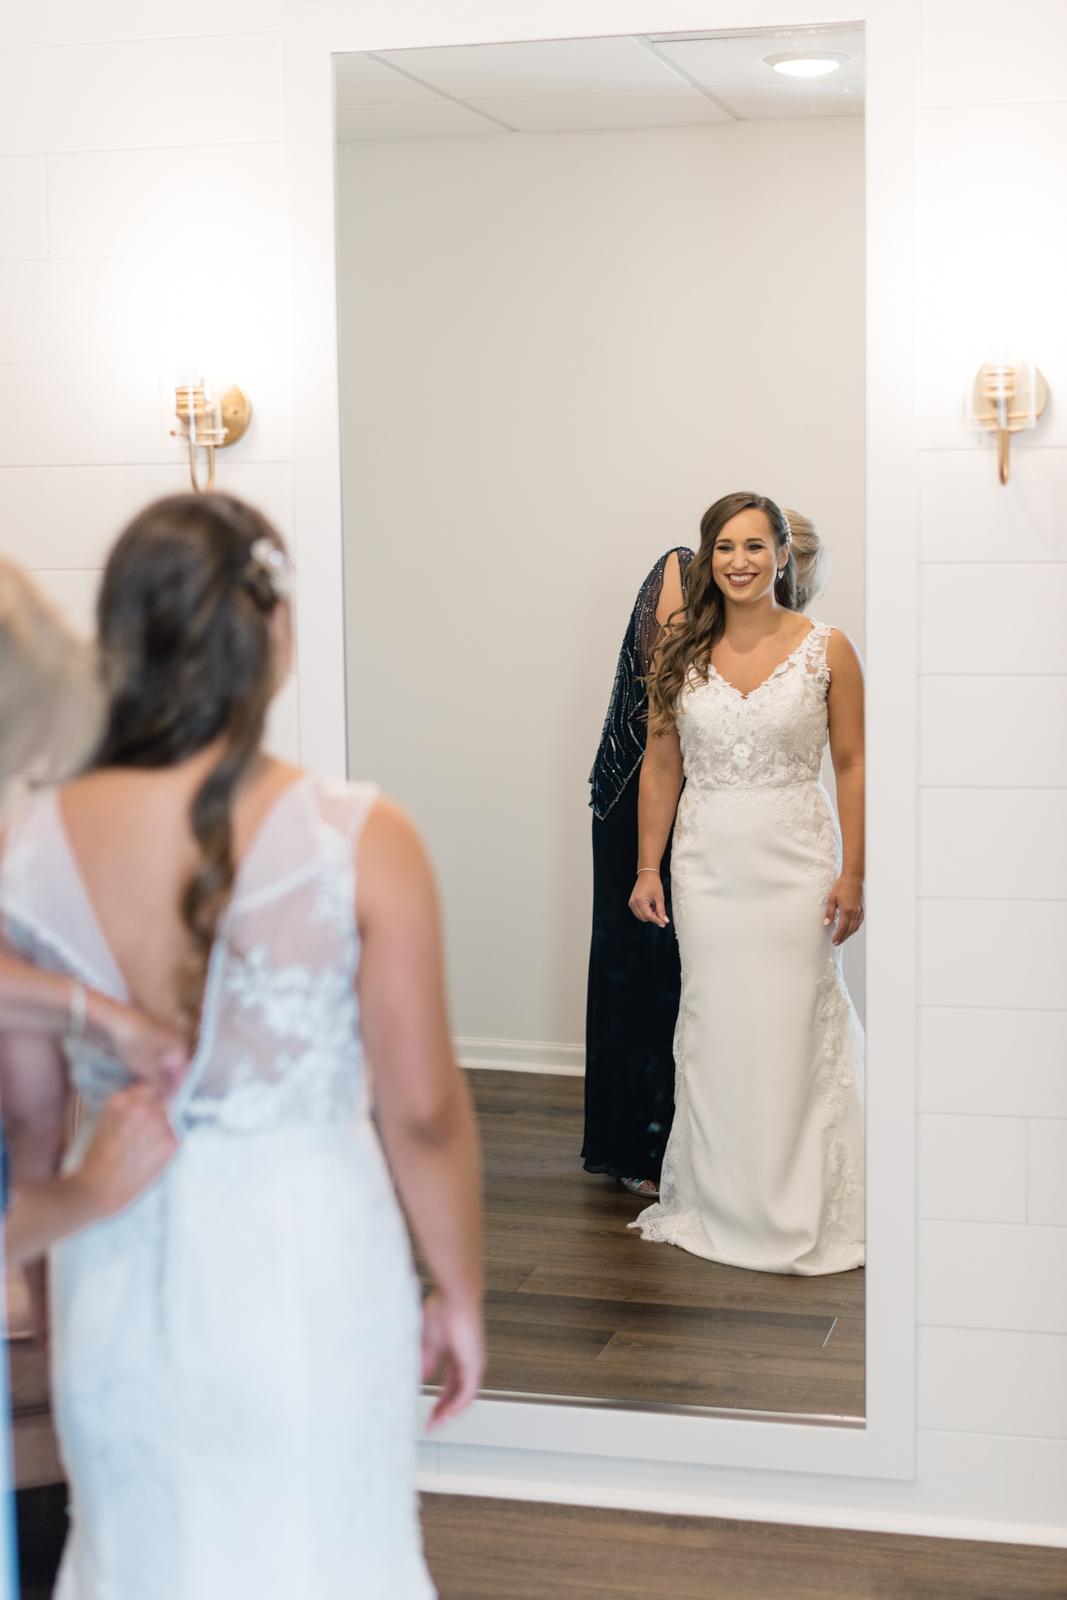 mom helping bride put on wedding dress bella sala in bridal suite bella sala wedding venue